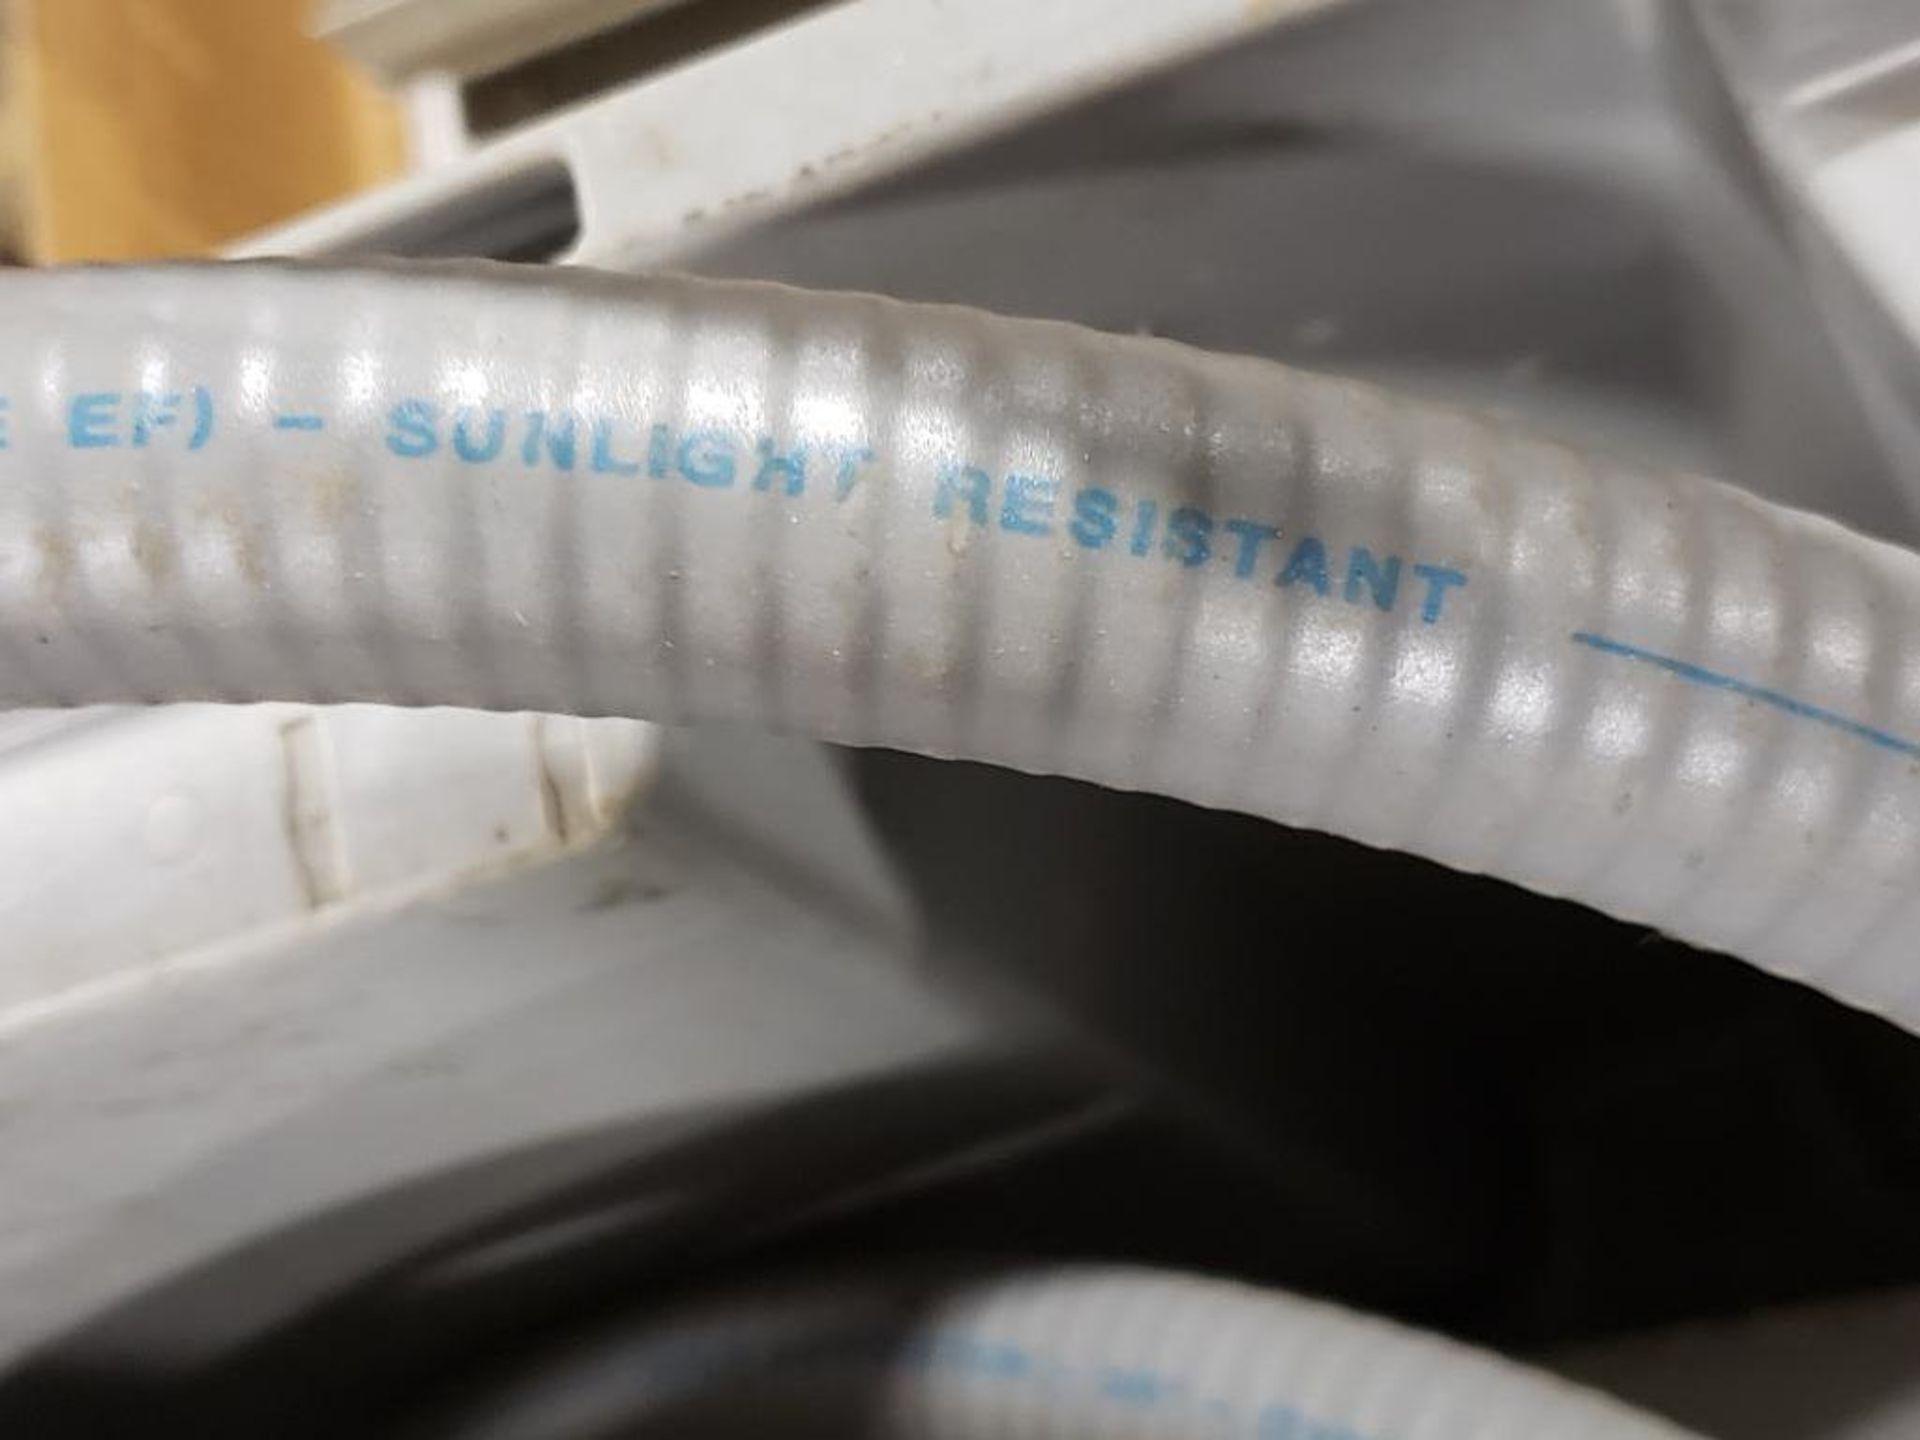 "Alflex Corp. 3/4"" Sunlight resistant conduit. - Image 5 of 5"